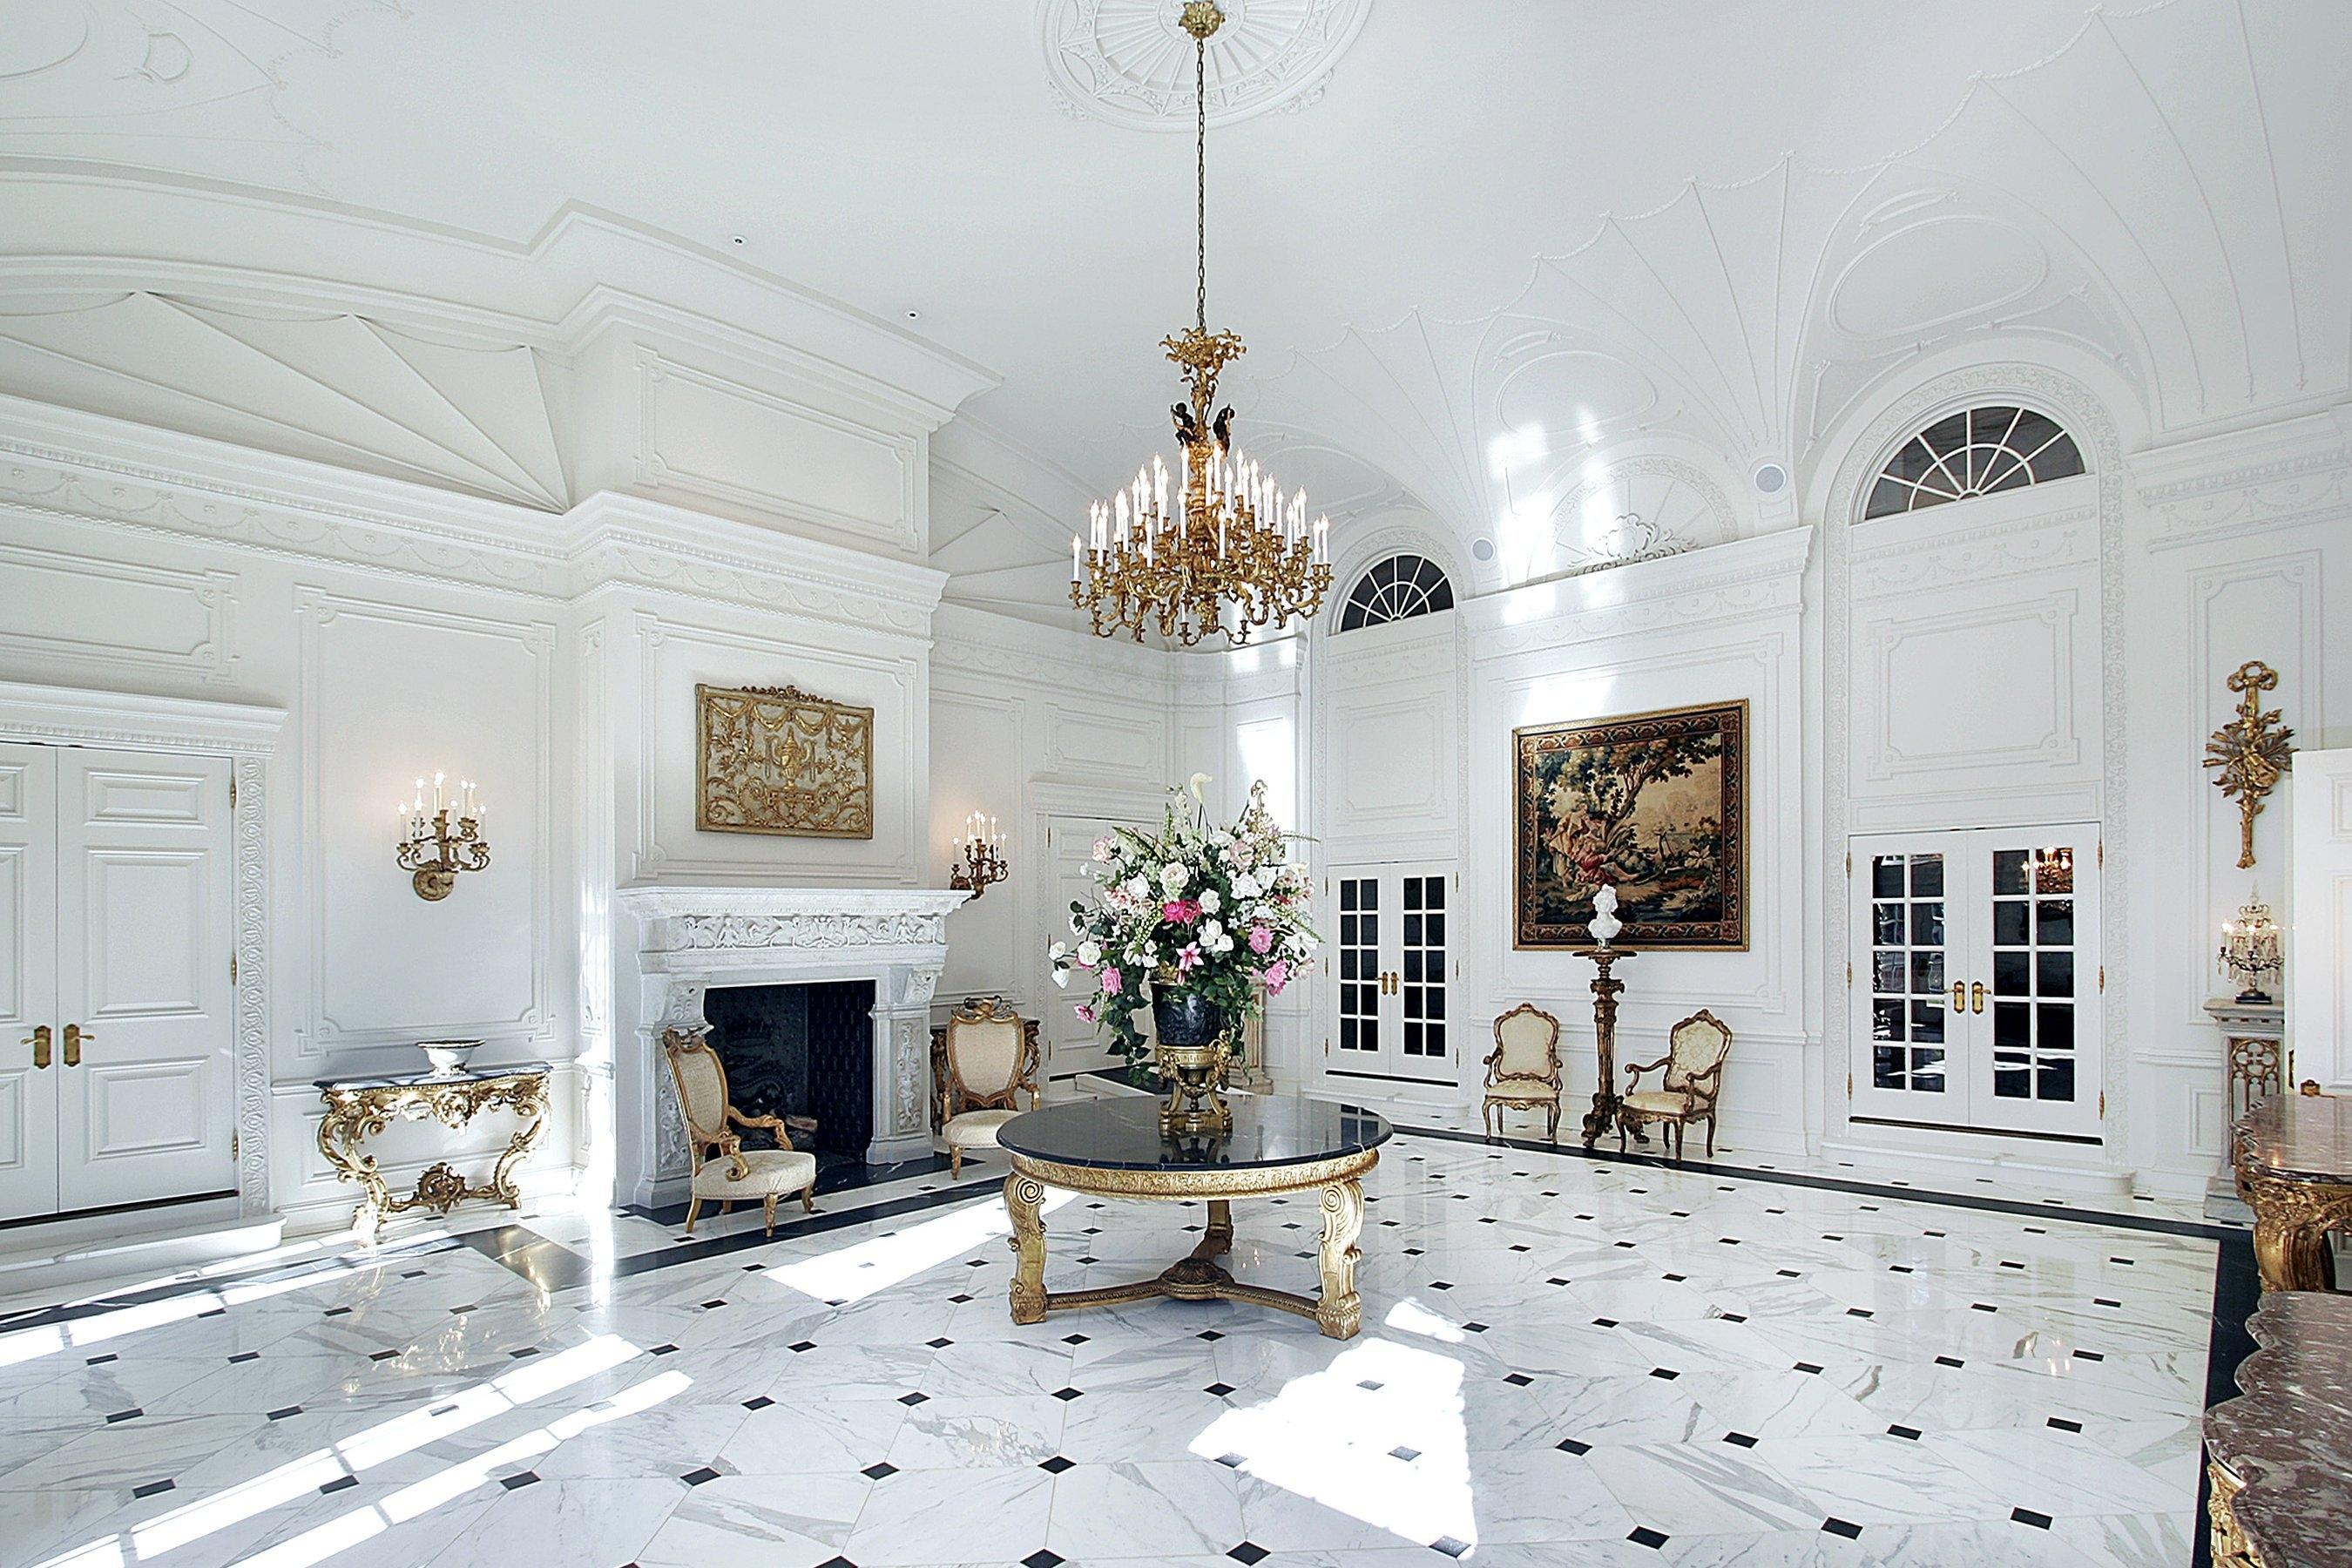 bigstock-Large-grand-foyer-in-luxury-ho-16567265